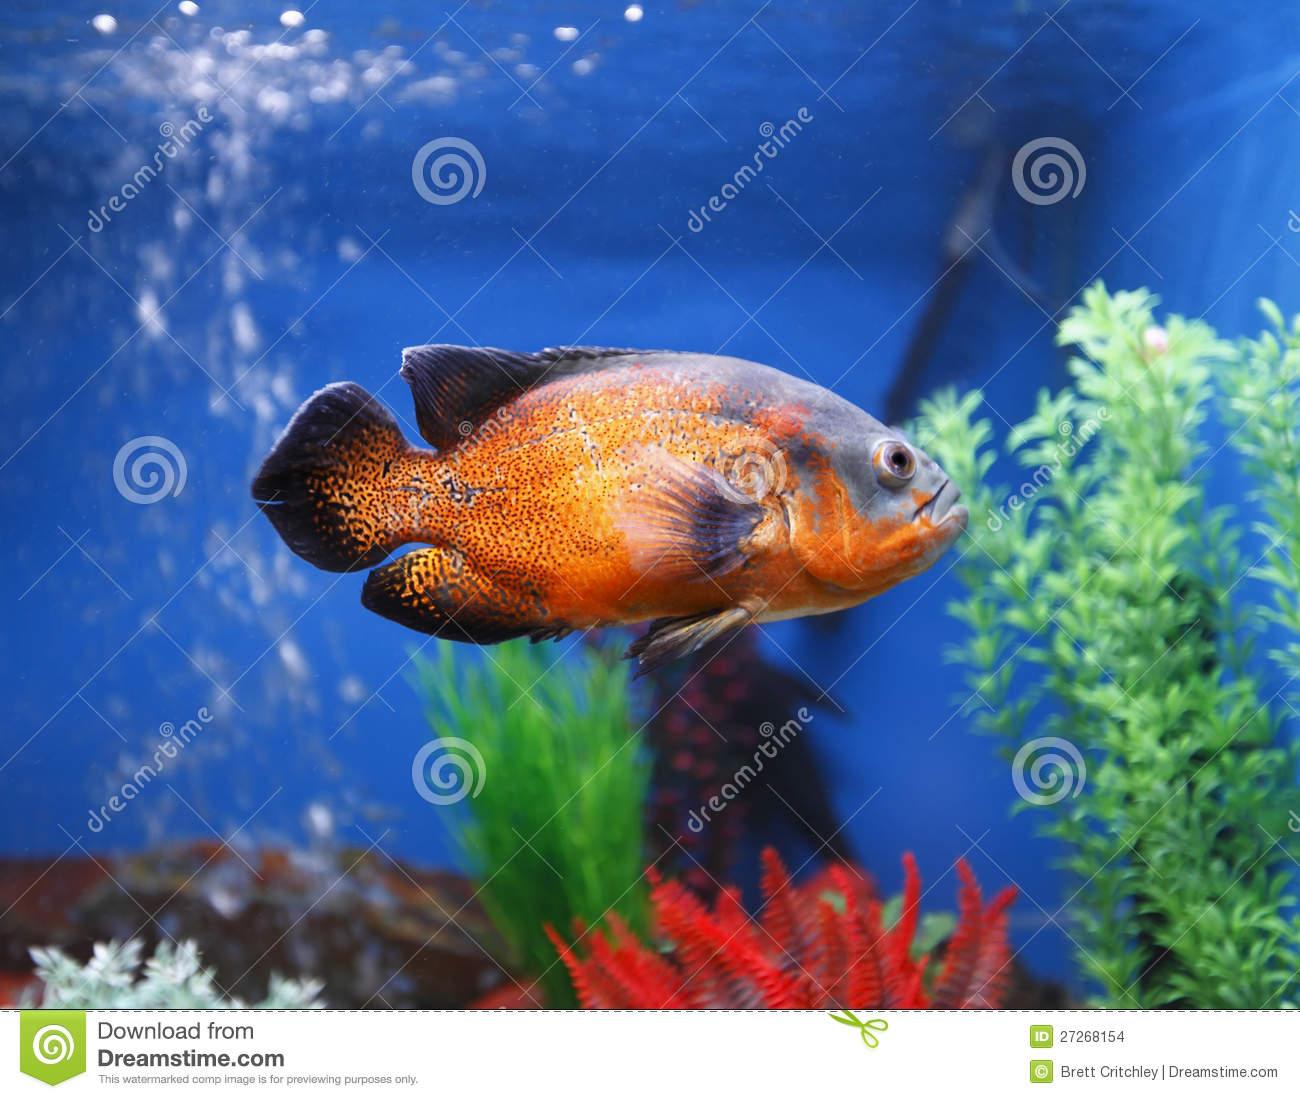 Oscar (Fish) clipart #12, Download drawings